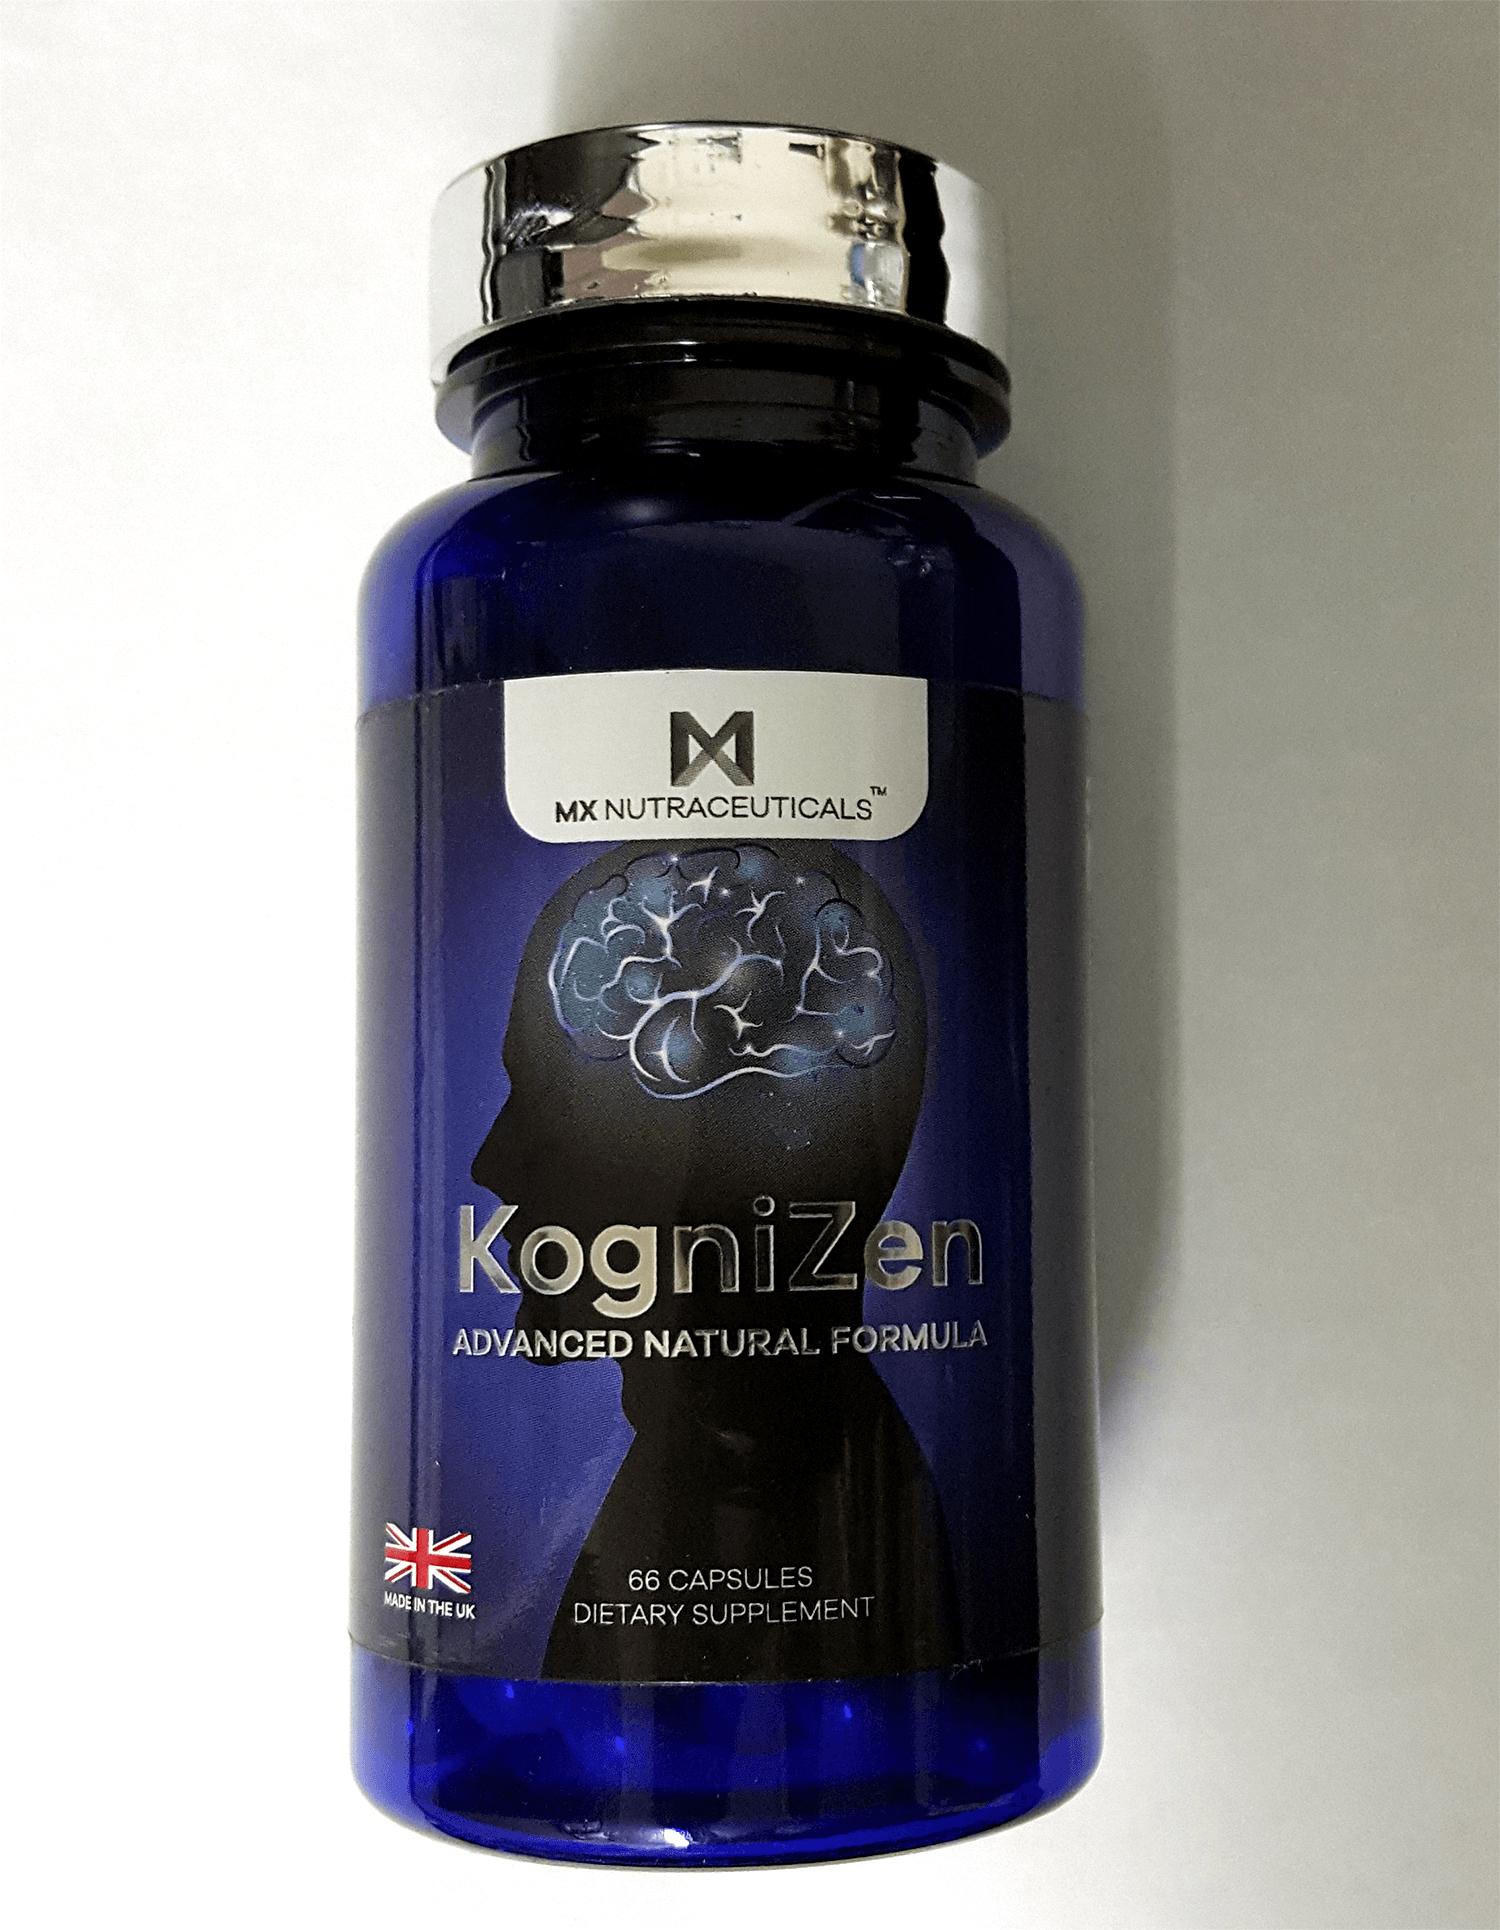 Front of the KogniZen bottle